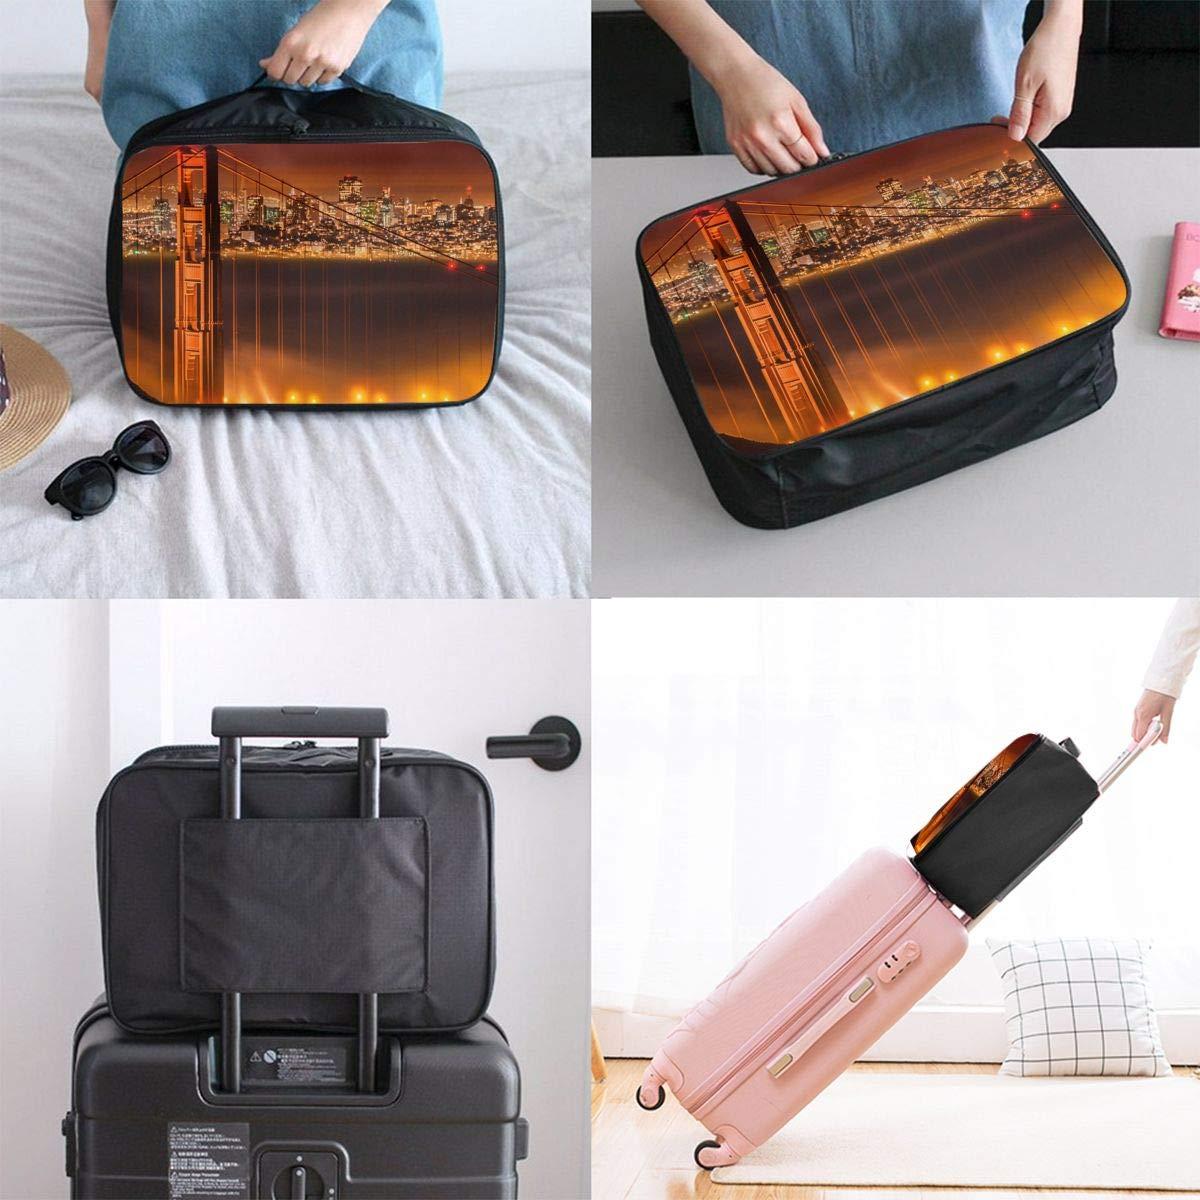 Travel Luggage Duffle Bag Lightweight Portable Handbag Golden Gate Bridge Large Capacity Waterproof Foldable Storage Tote